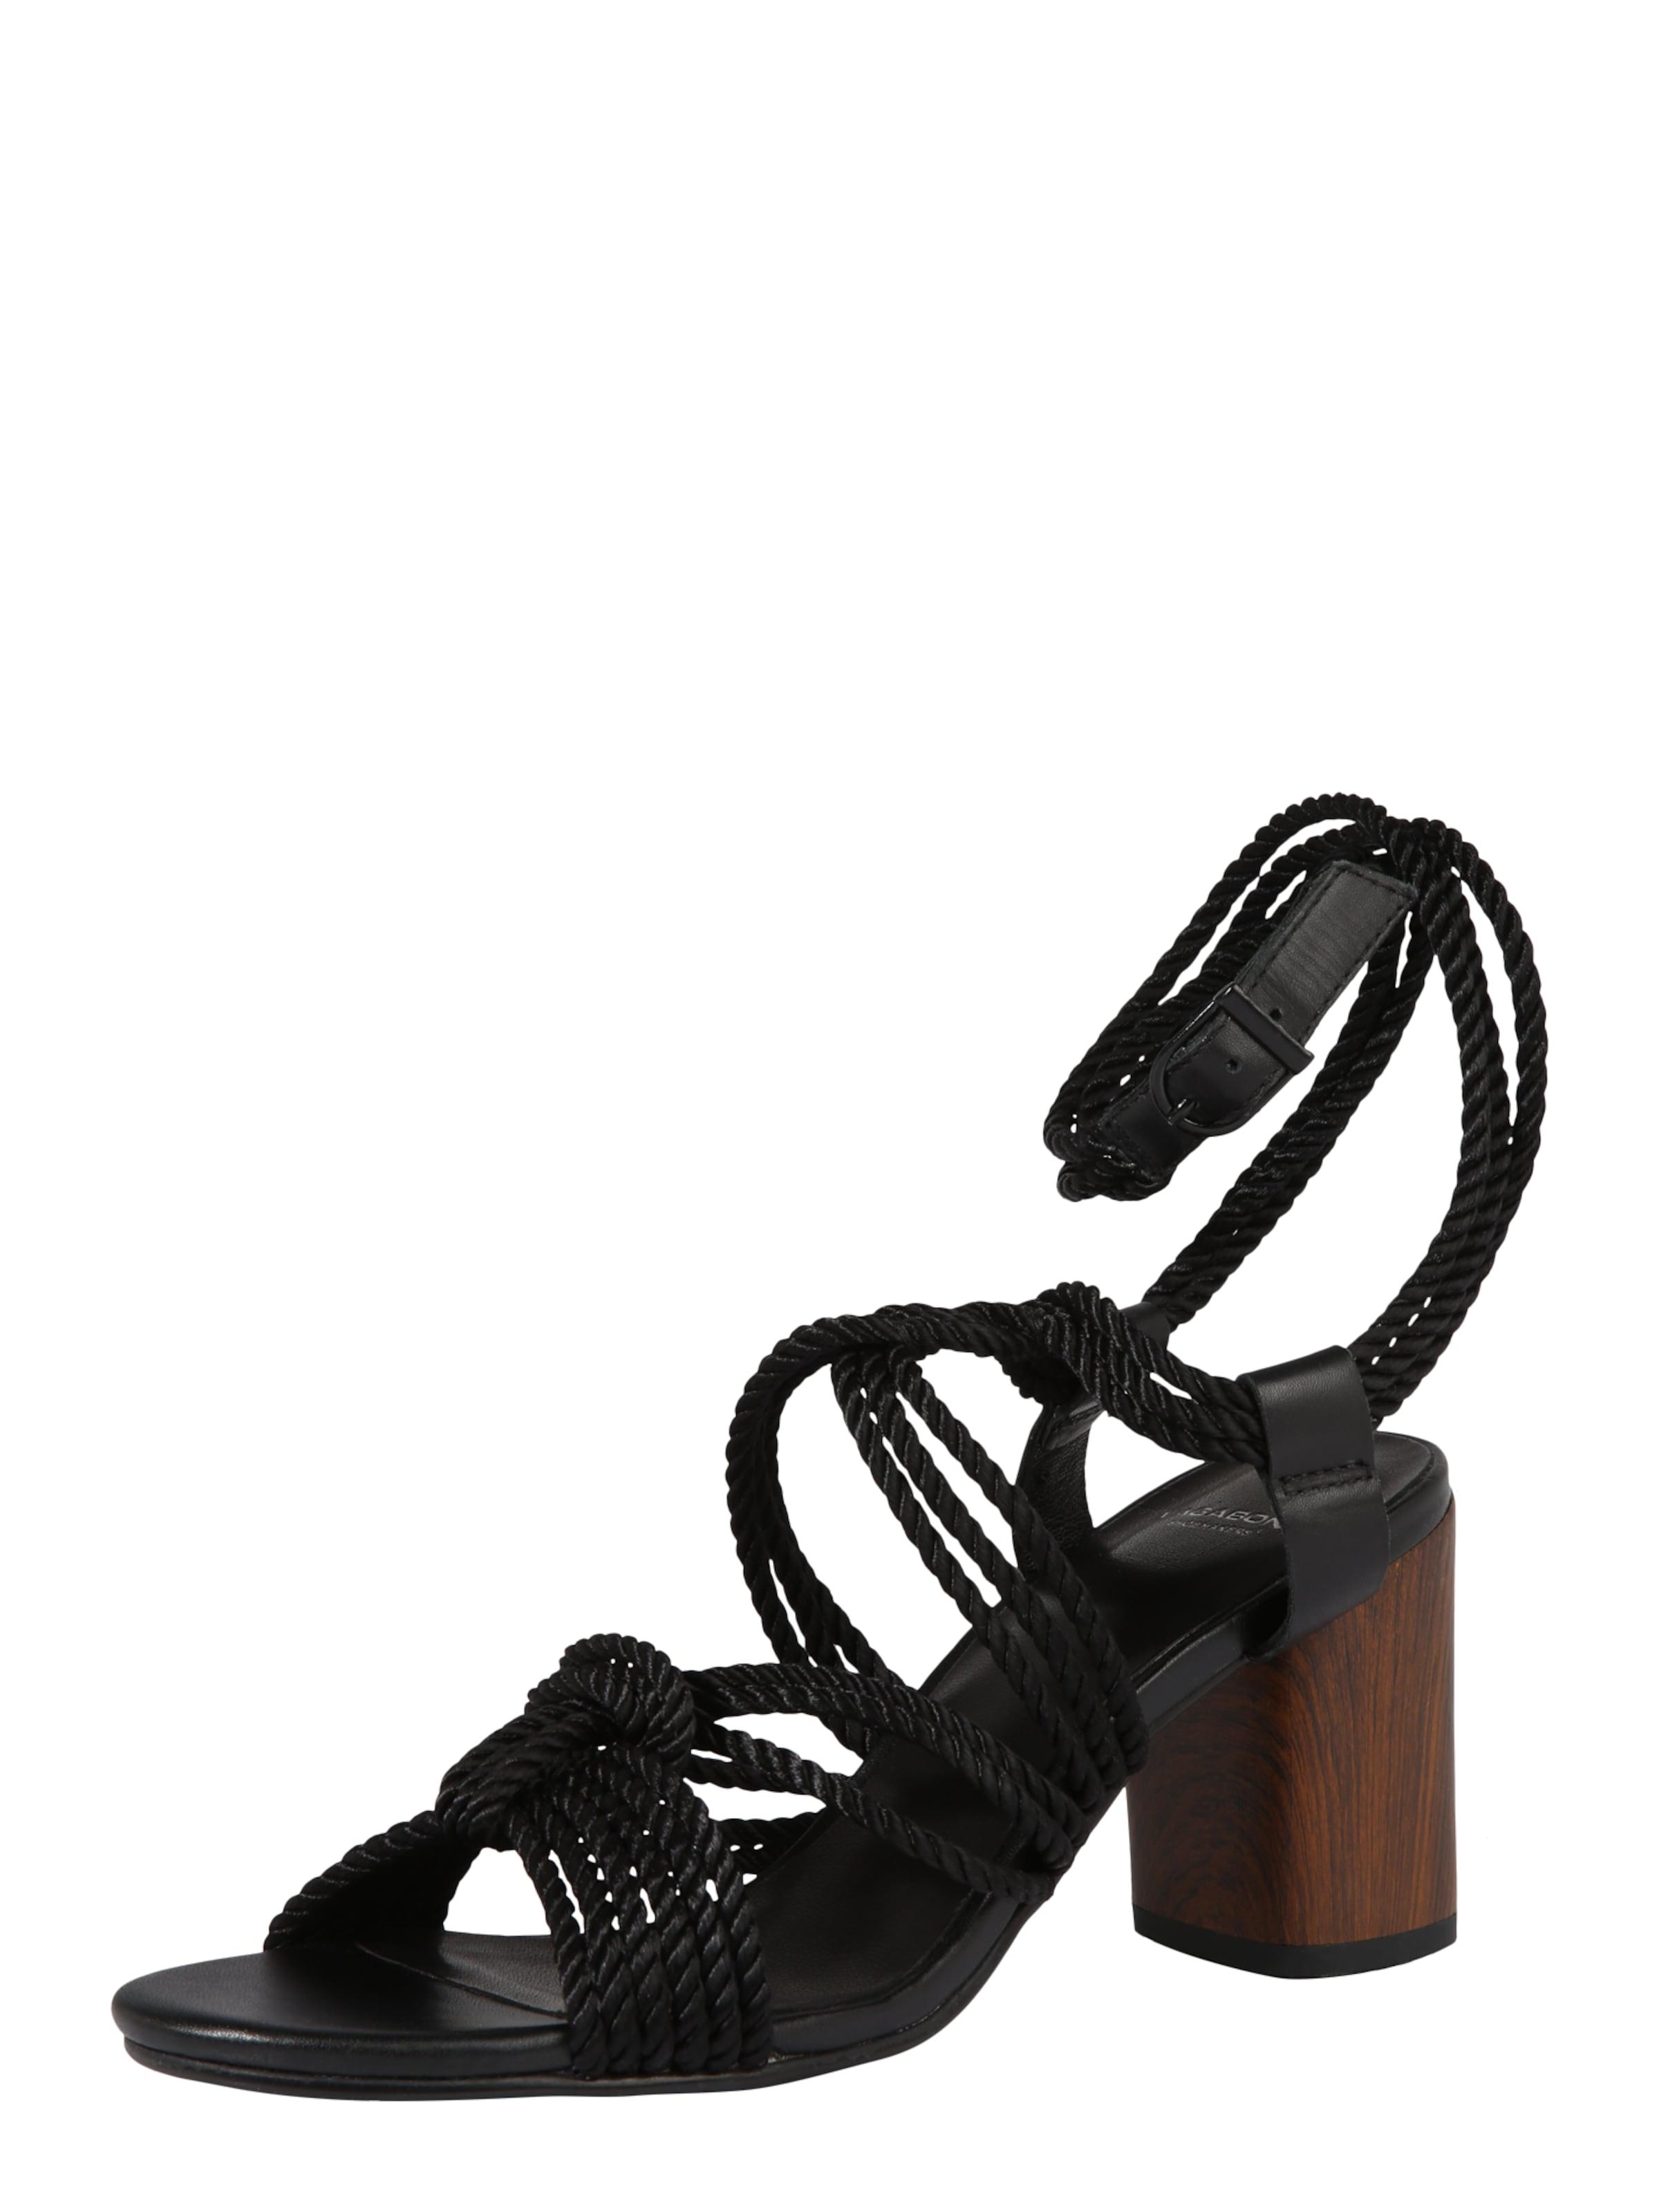 Haltbare Mode billige Schuhe VAGABOND SHOEMAKERS   Sandalette 'Carol' 'Carol' 'Carol' Schuhe Gut getragene Schuhe 112f15